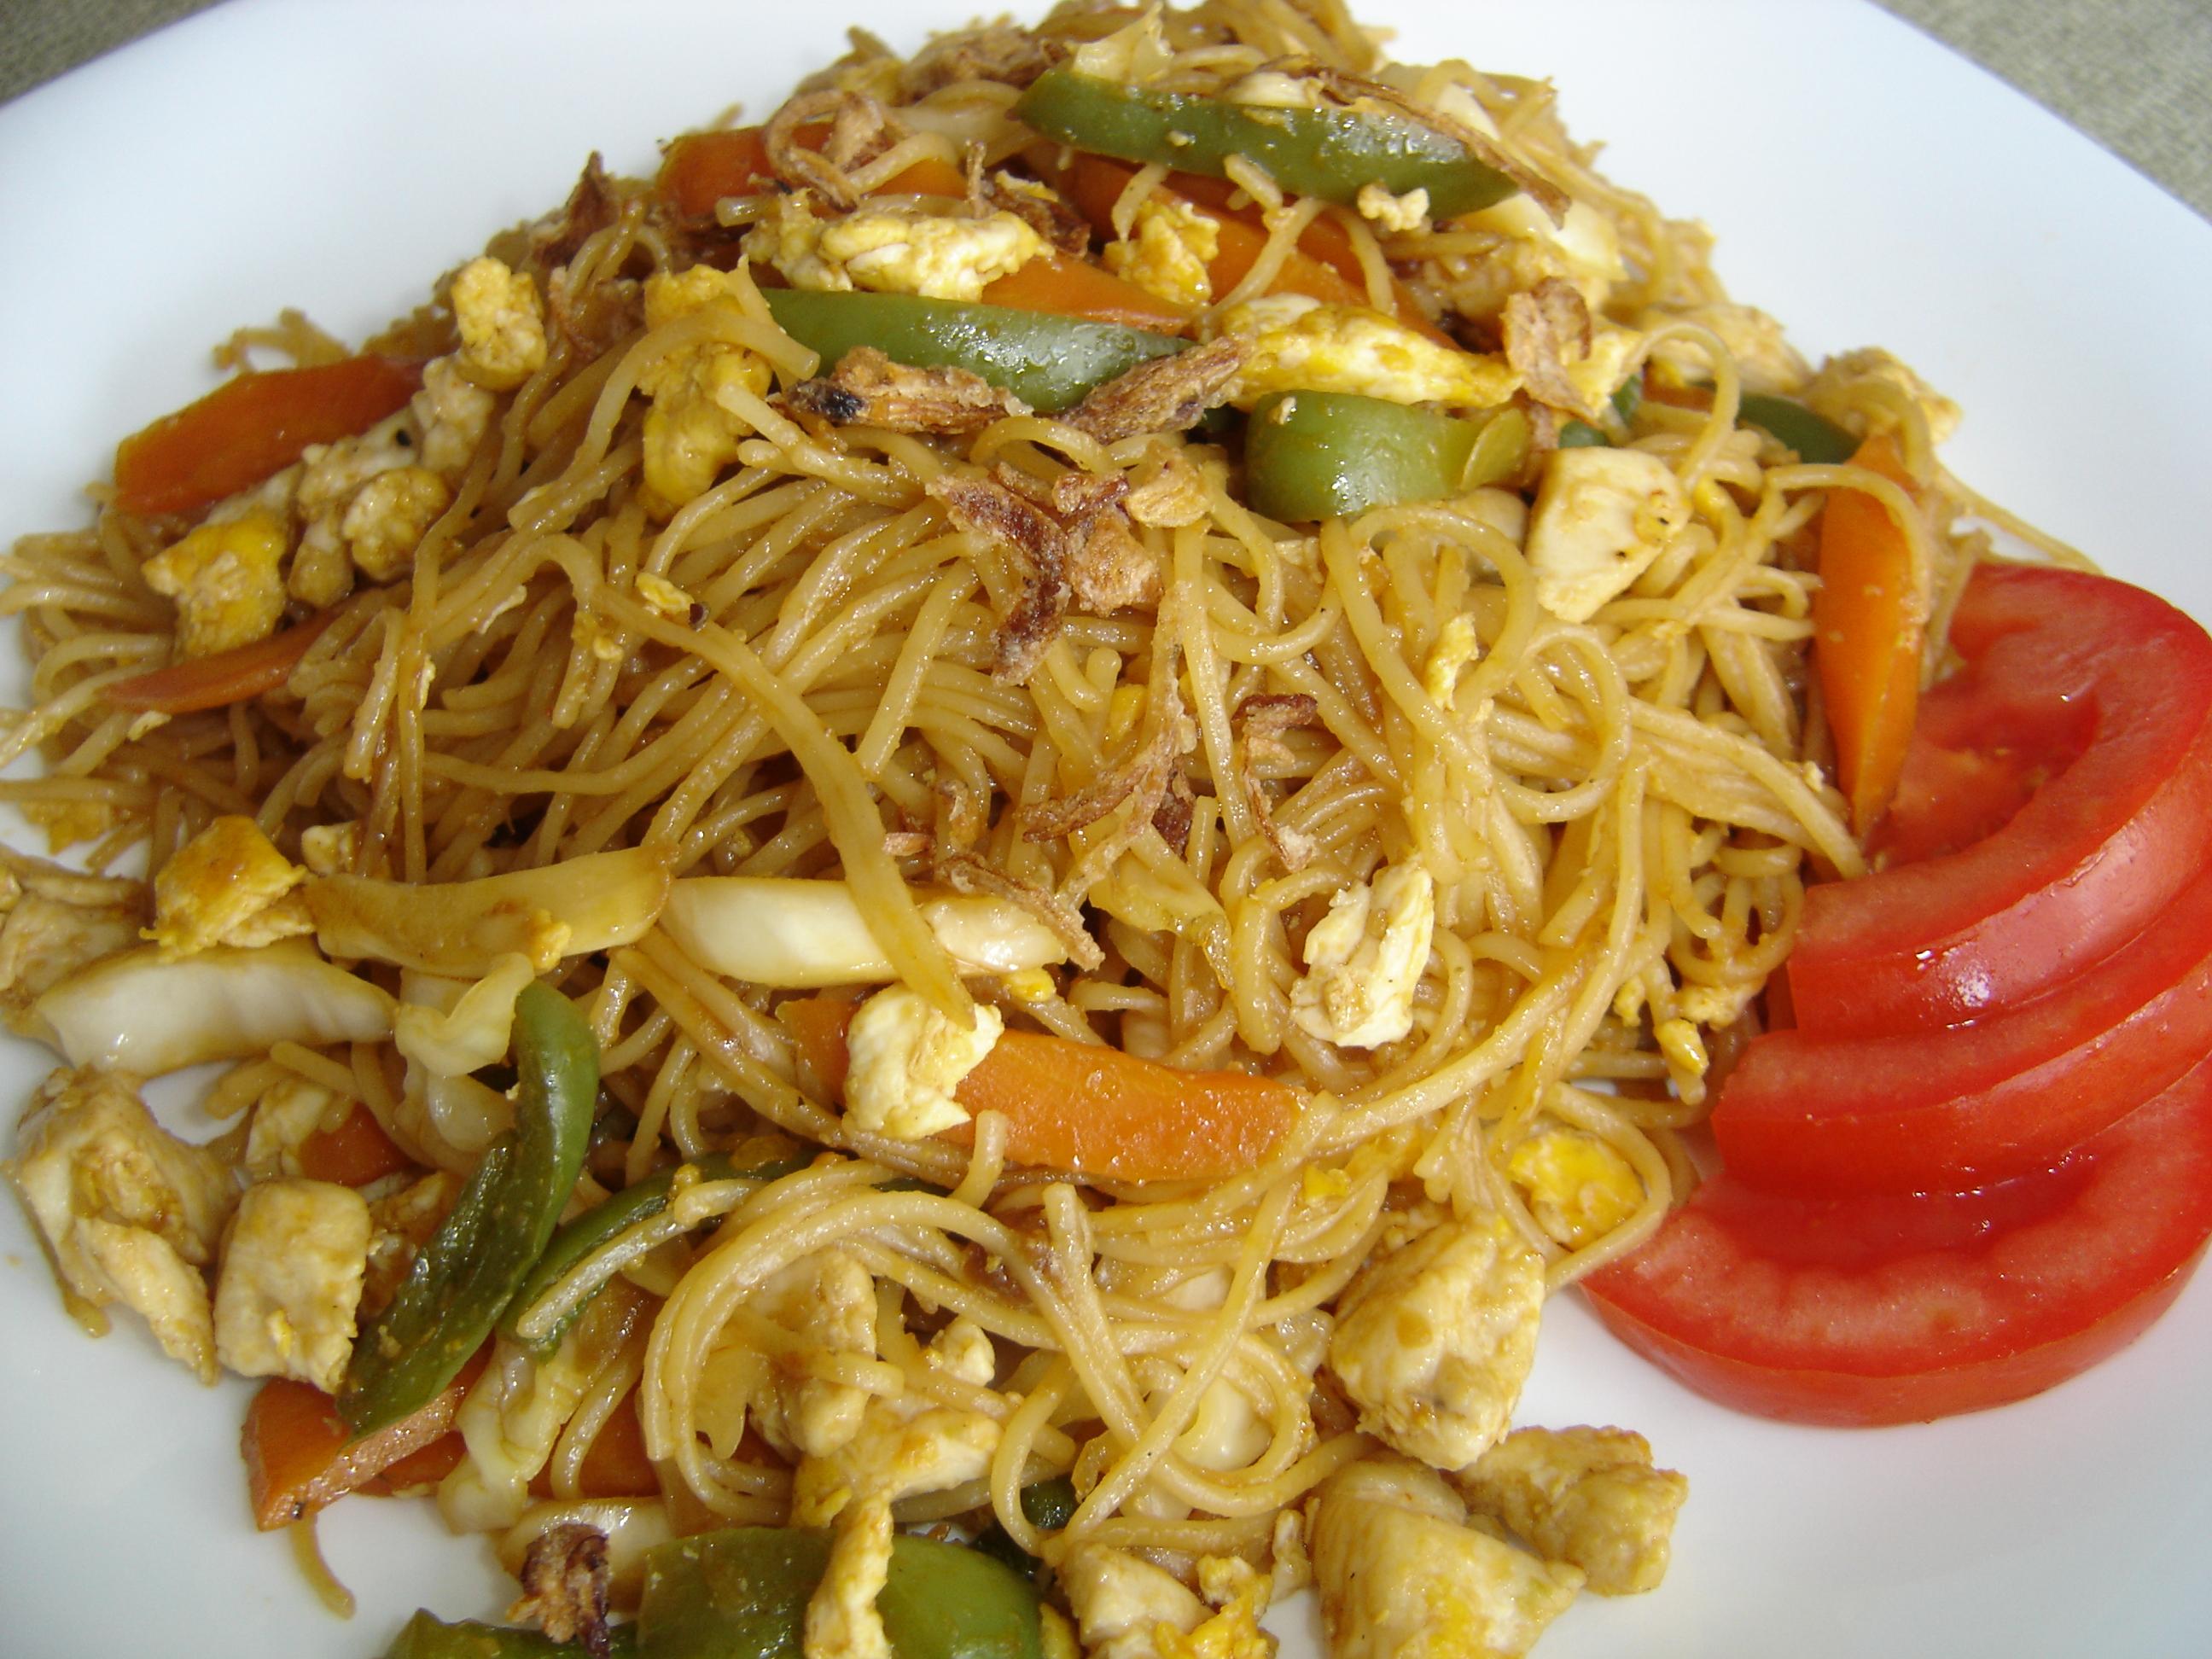 Tasty Indonesian Food - Mie Goreng Ayam Oyster Eating Salt